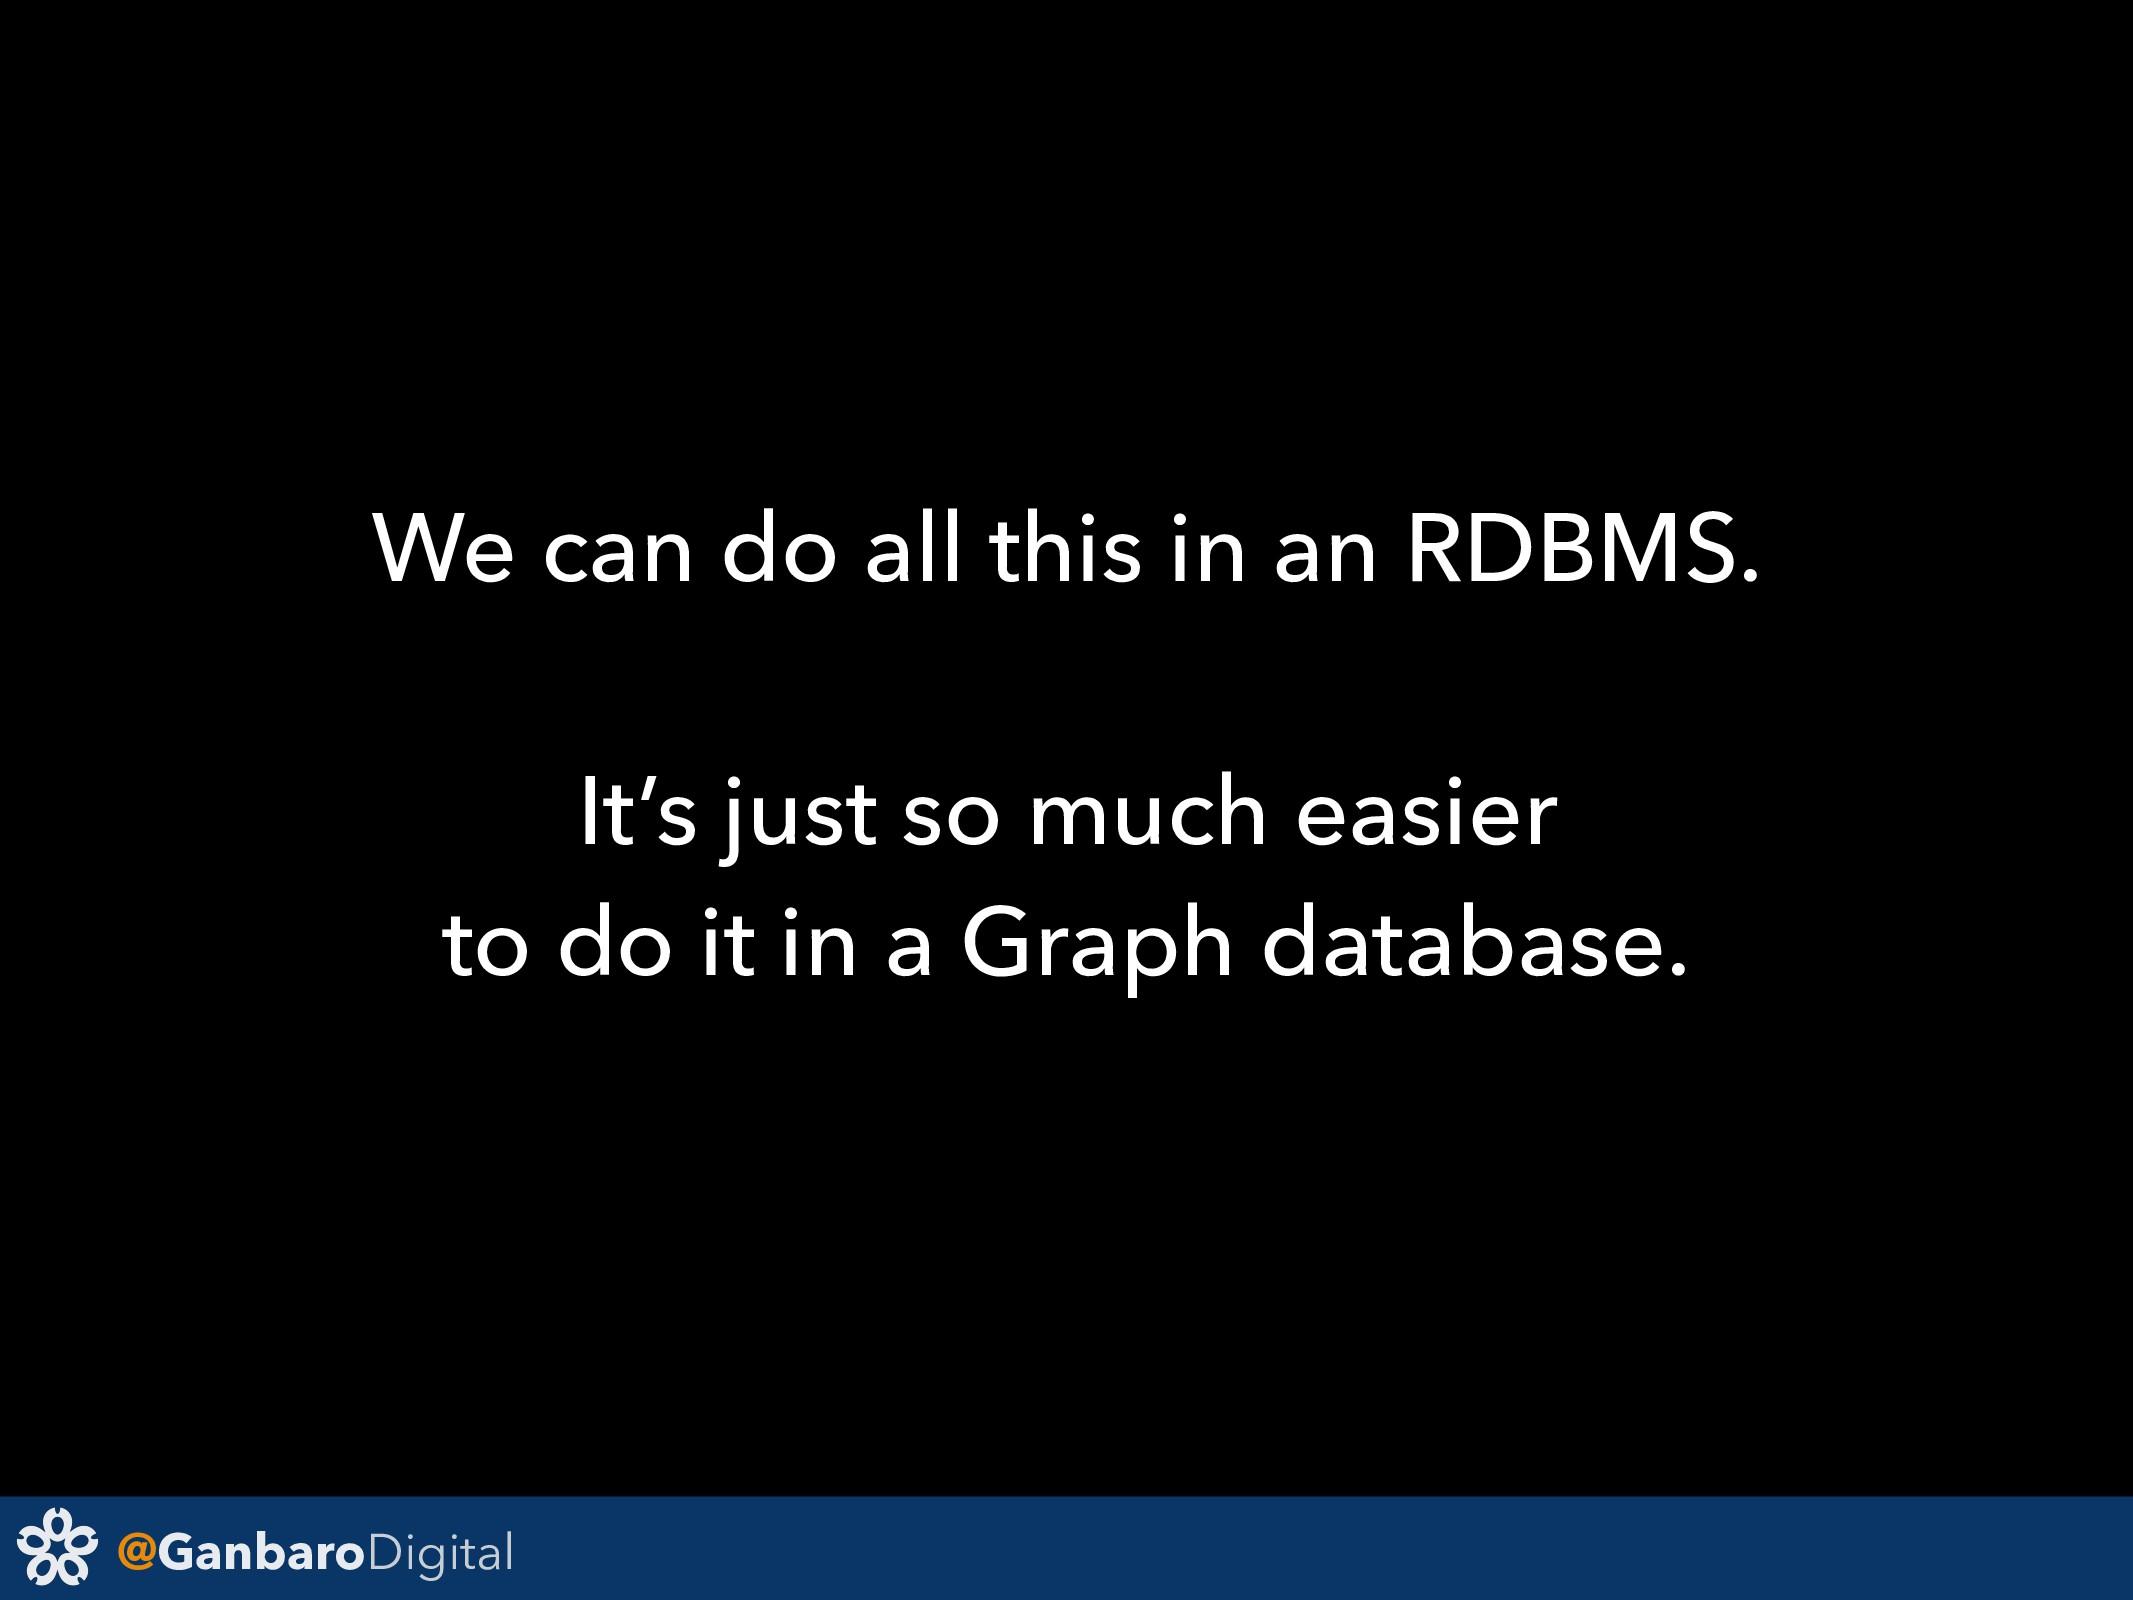 @GanbaroDigital We can do all this in an RDBMS....